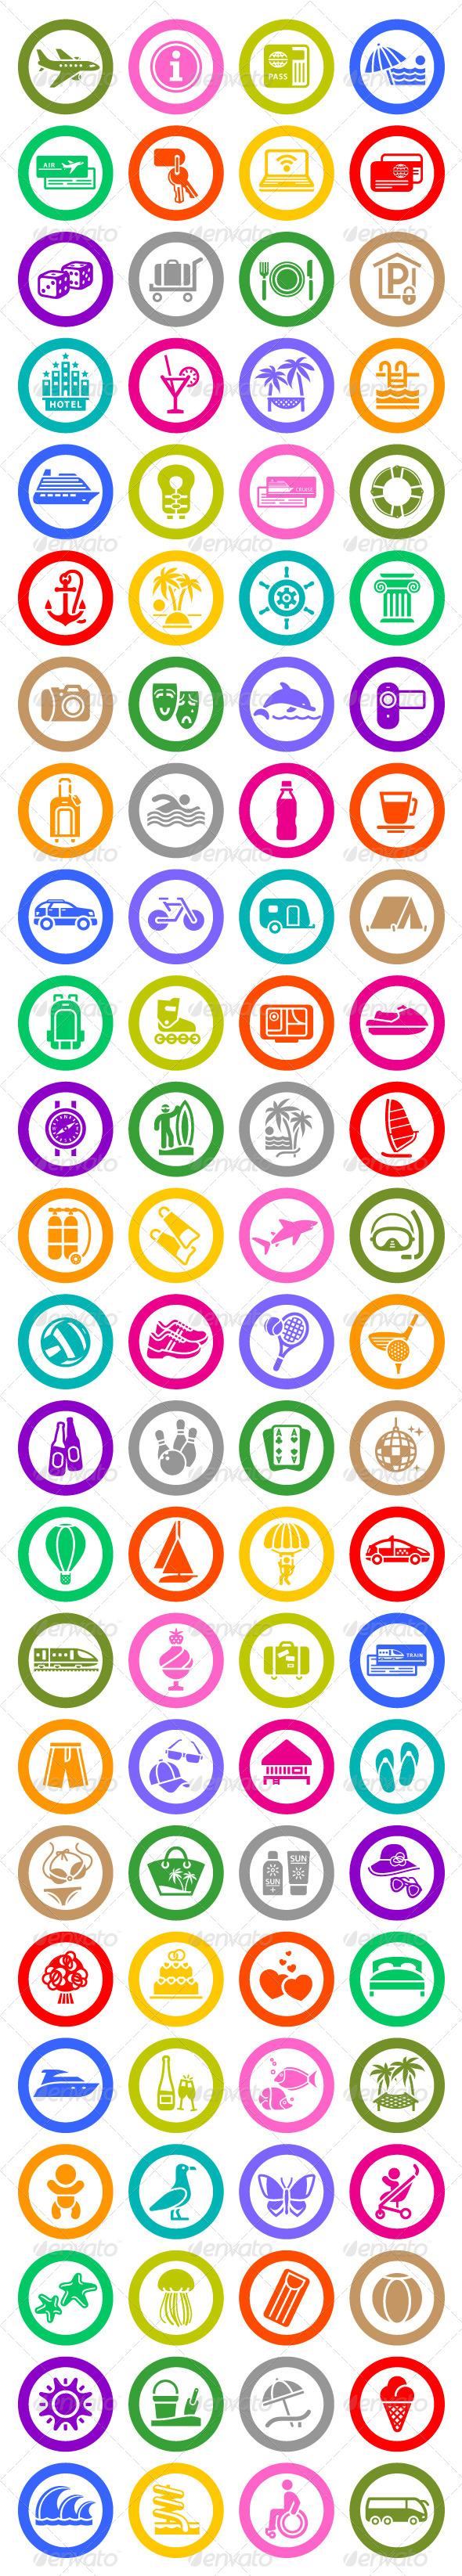 96 pcs. Vacation Icons. Travel Symbols - Icons